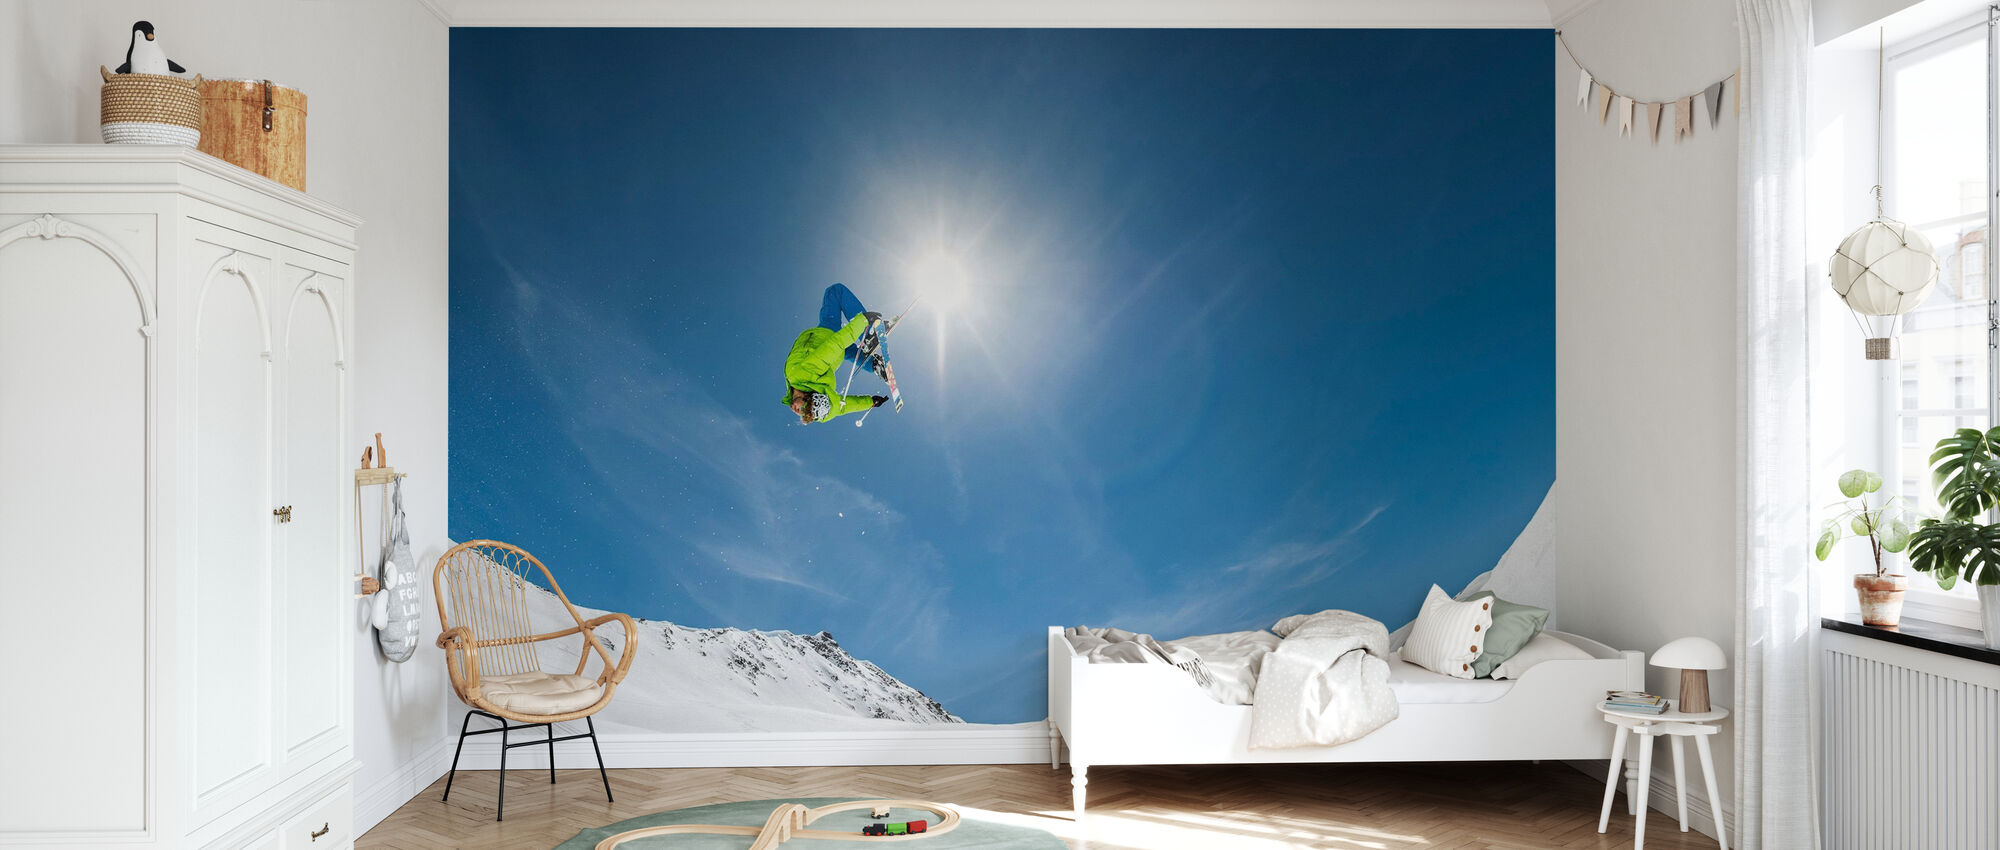 Backflip Crossed Skis - Wallpaper - Kids Room